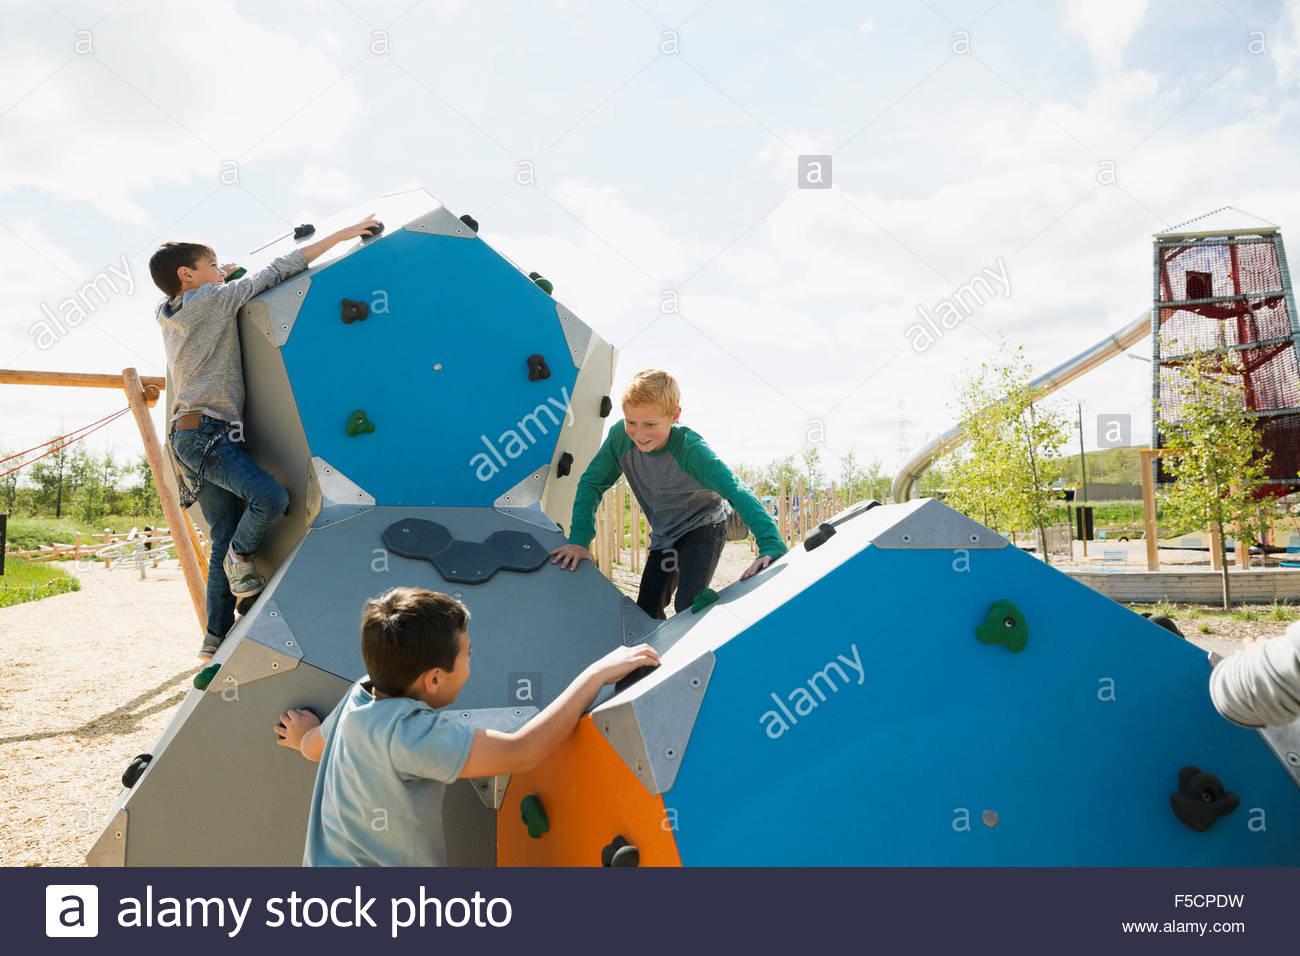 Boys climbing geometric shapes at sunny playground - Stock Image